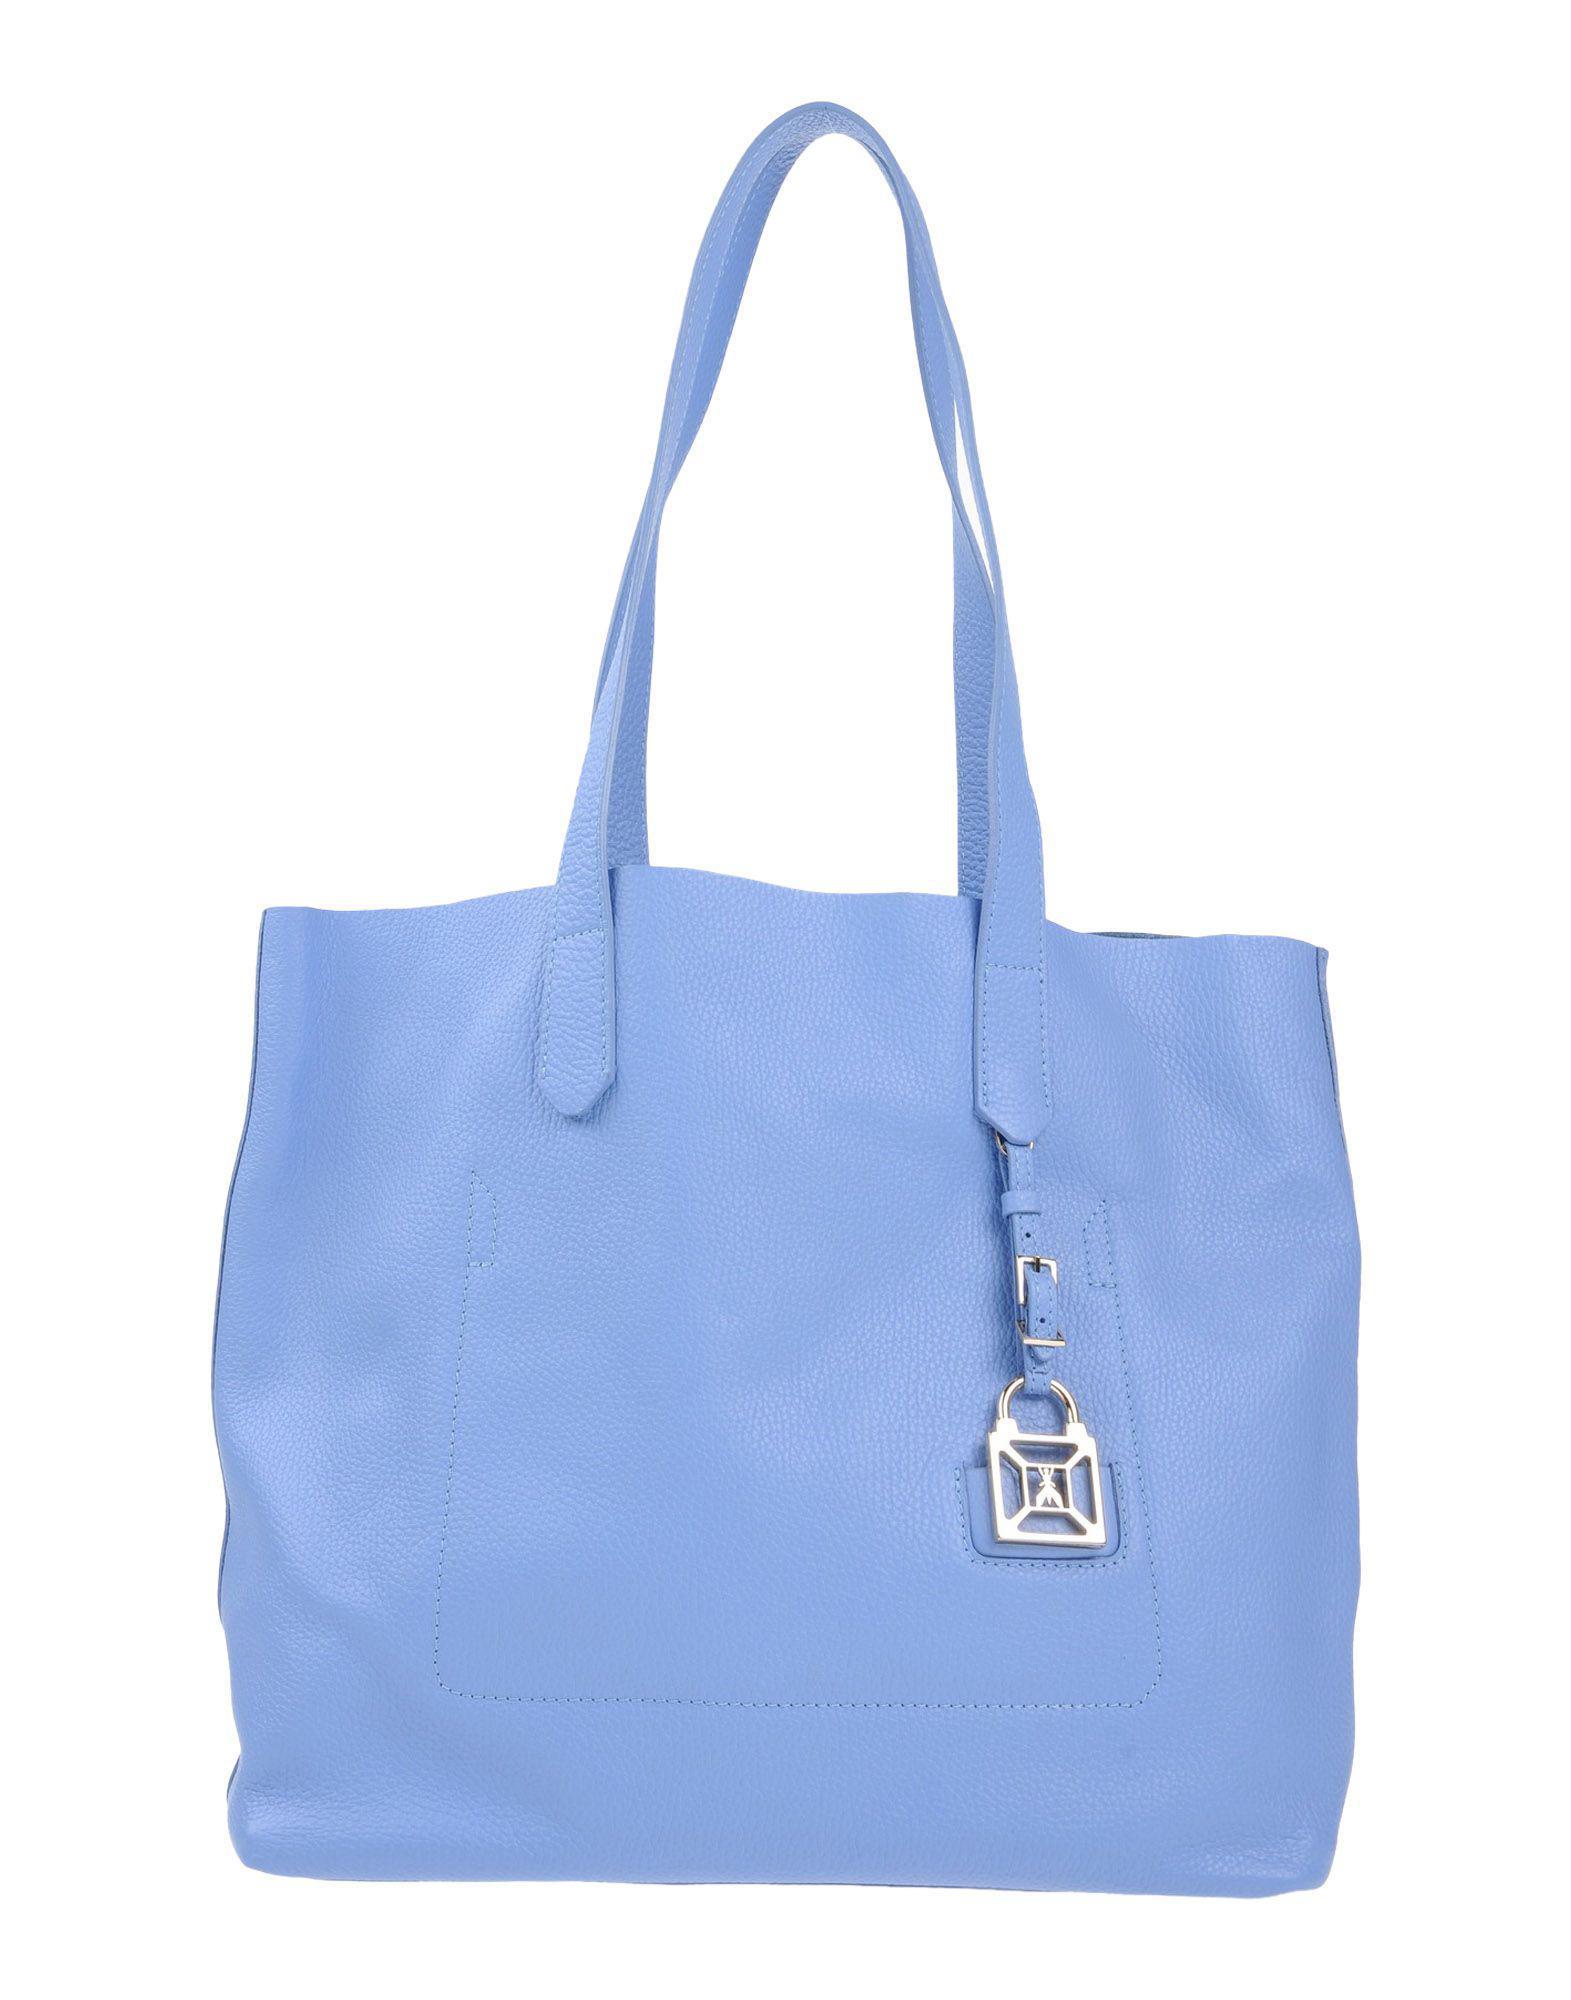 cec18db000 Lyst - Patrizia Pepe Shoulder Bag in Purple